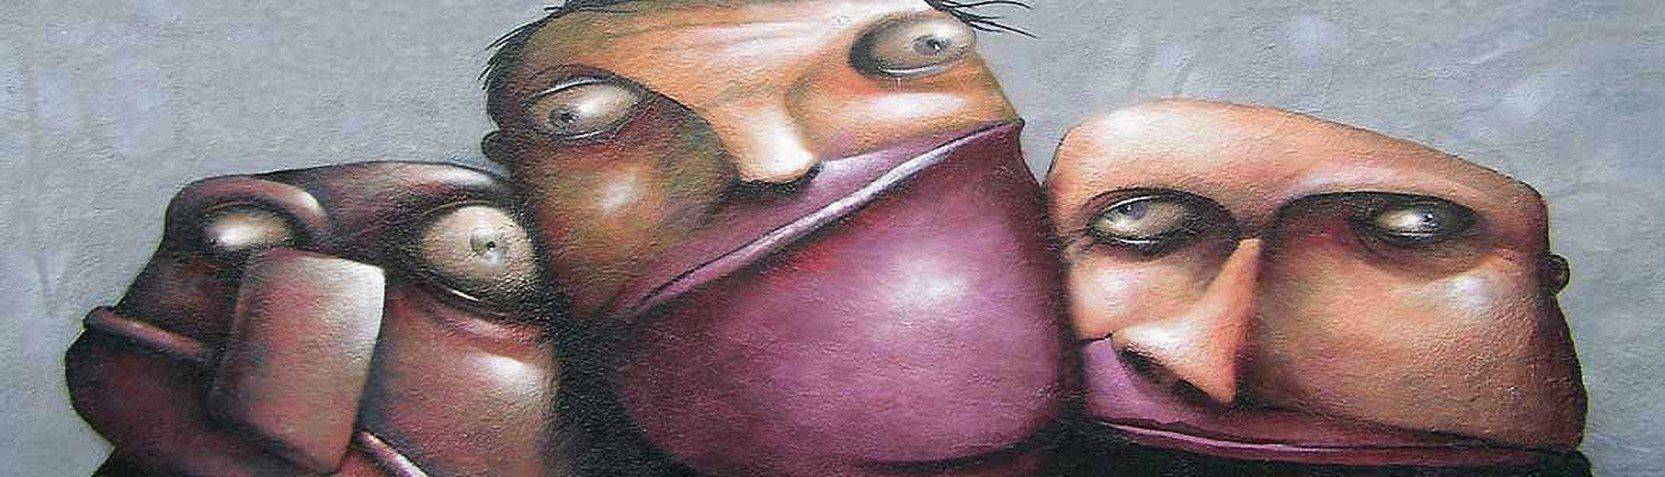 Kunststile - Graffiti und Streetart